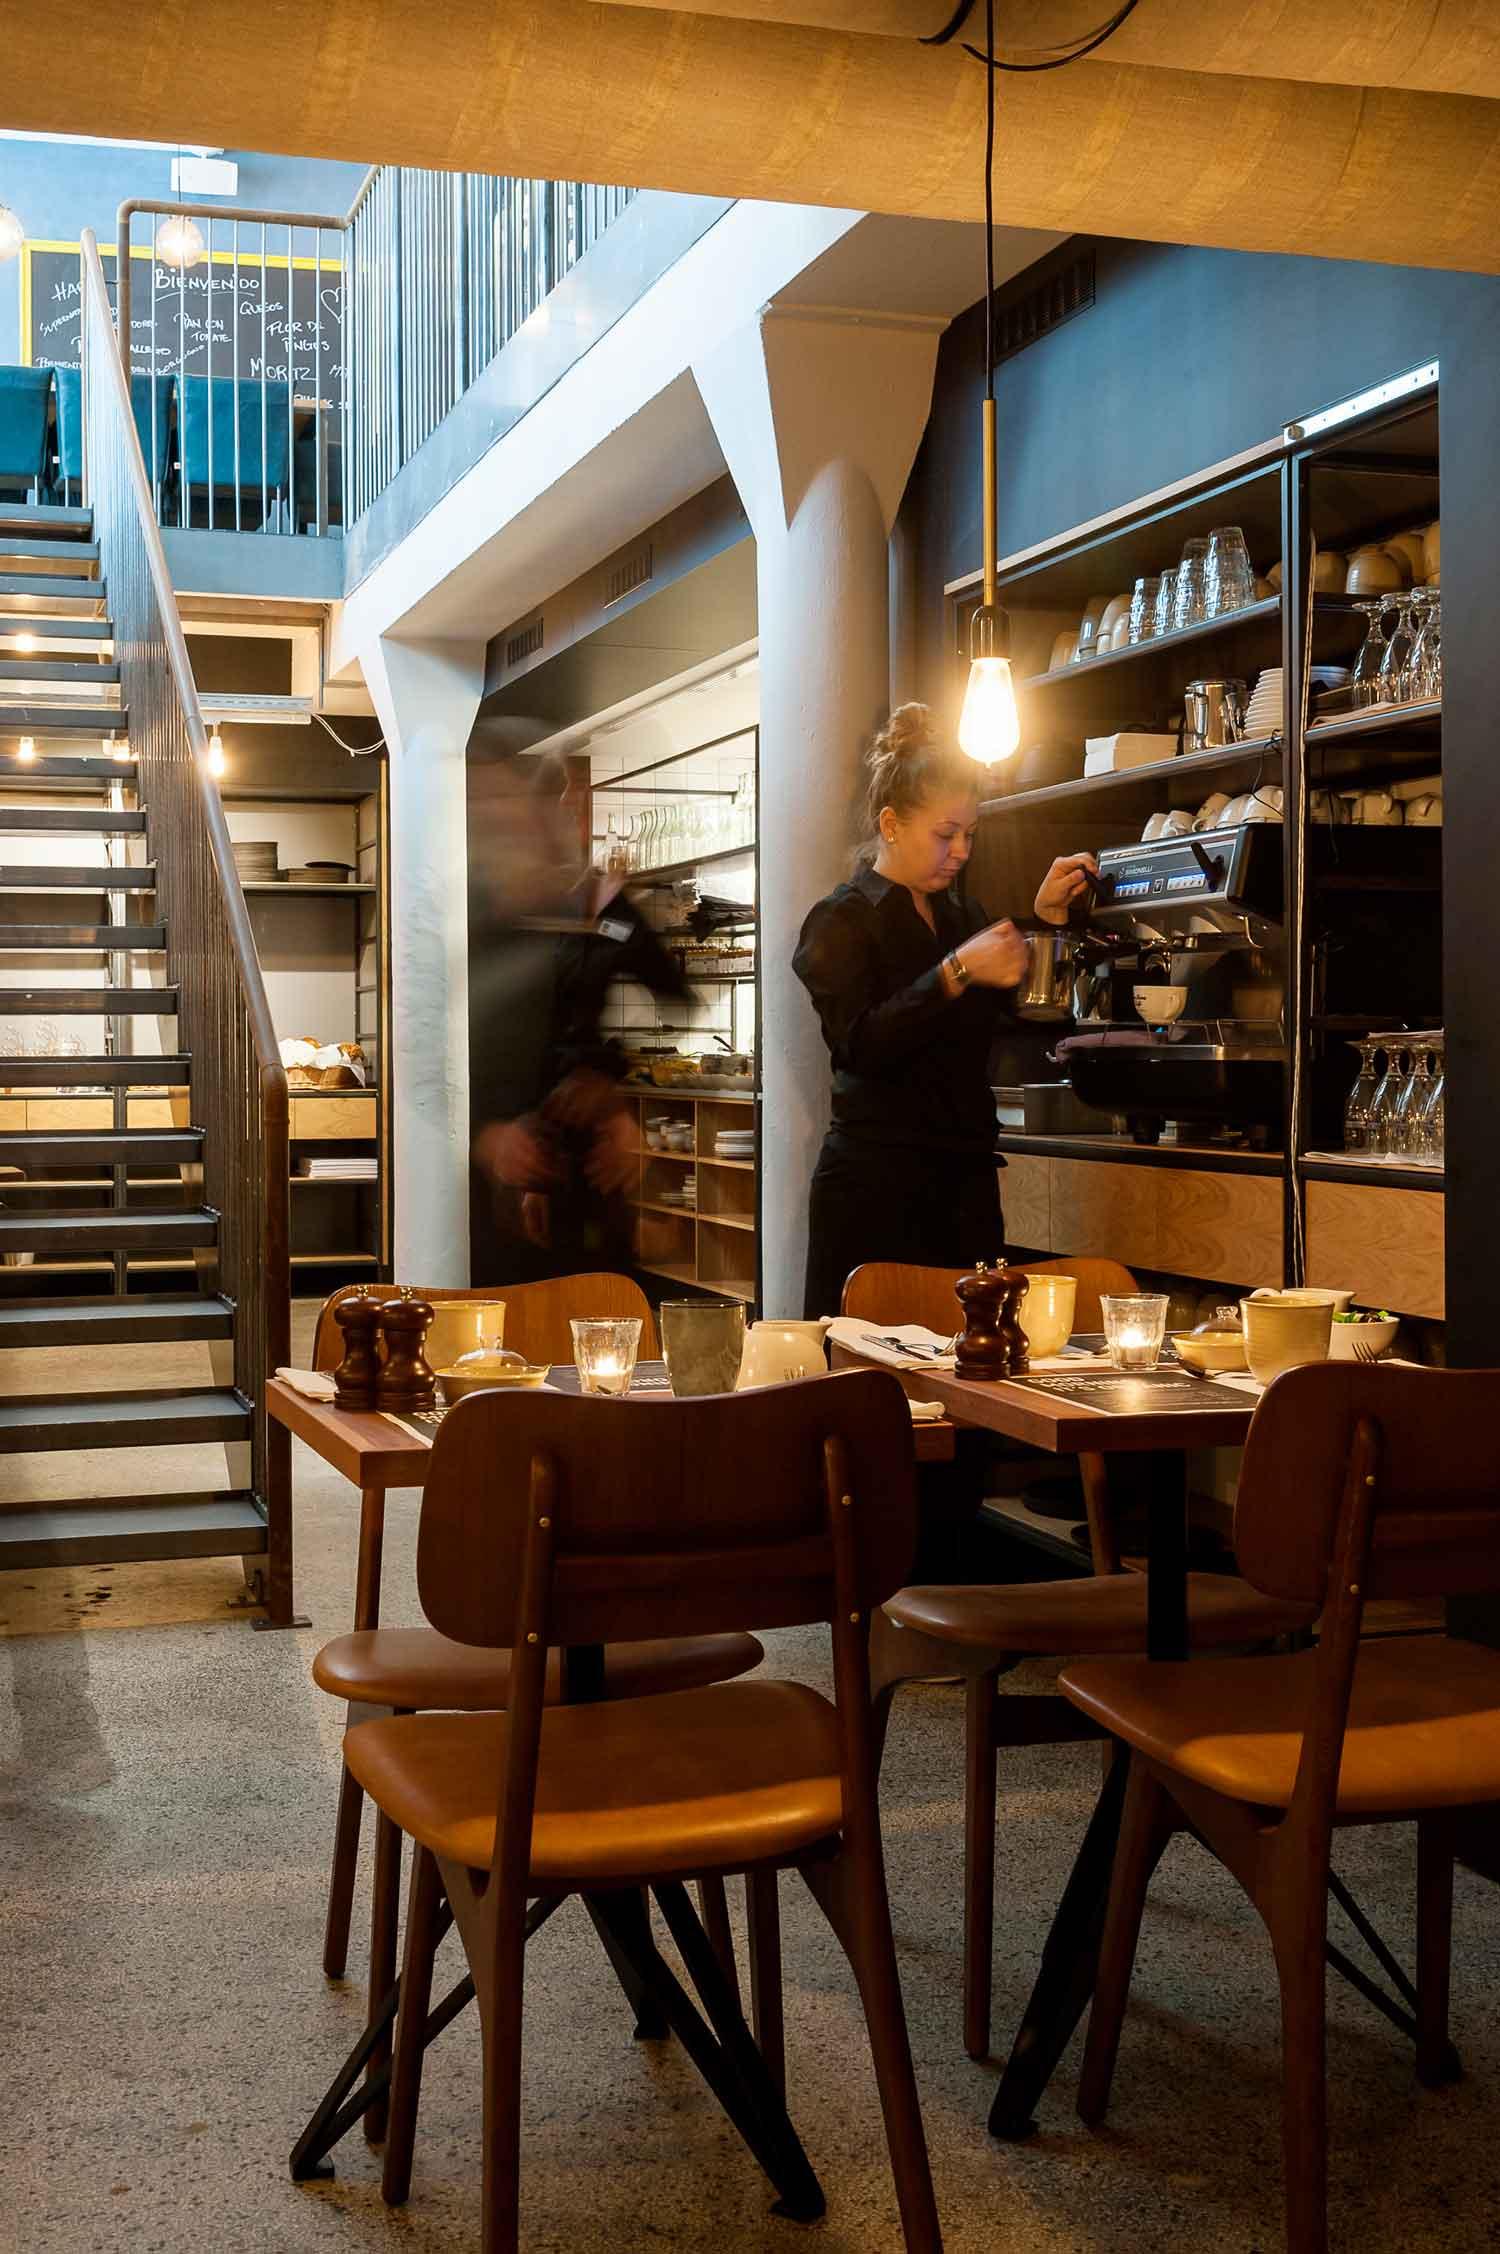 Hotel SP34 Designed by Morten Hedegaard // Copenhagen, Denmark | Yellowtrace